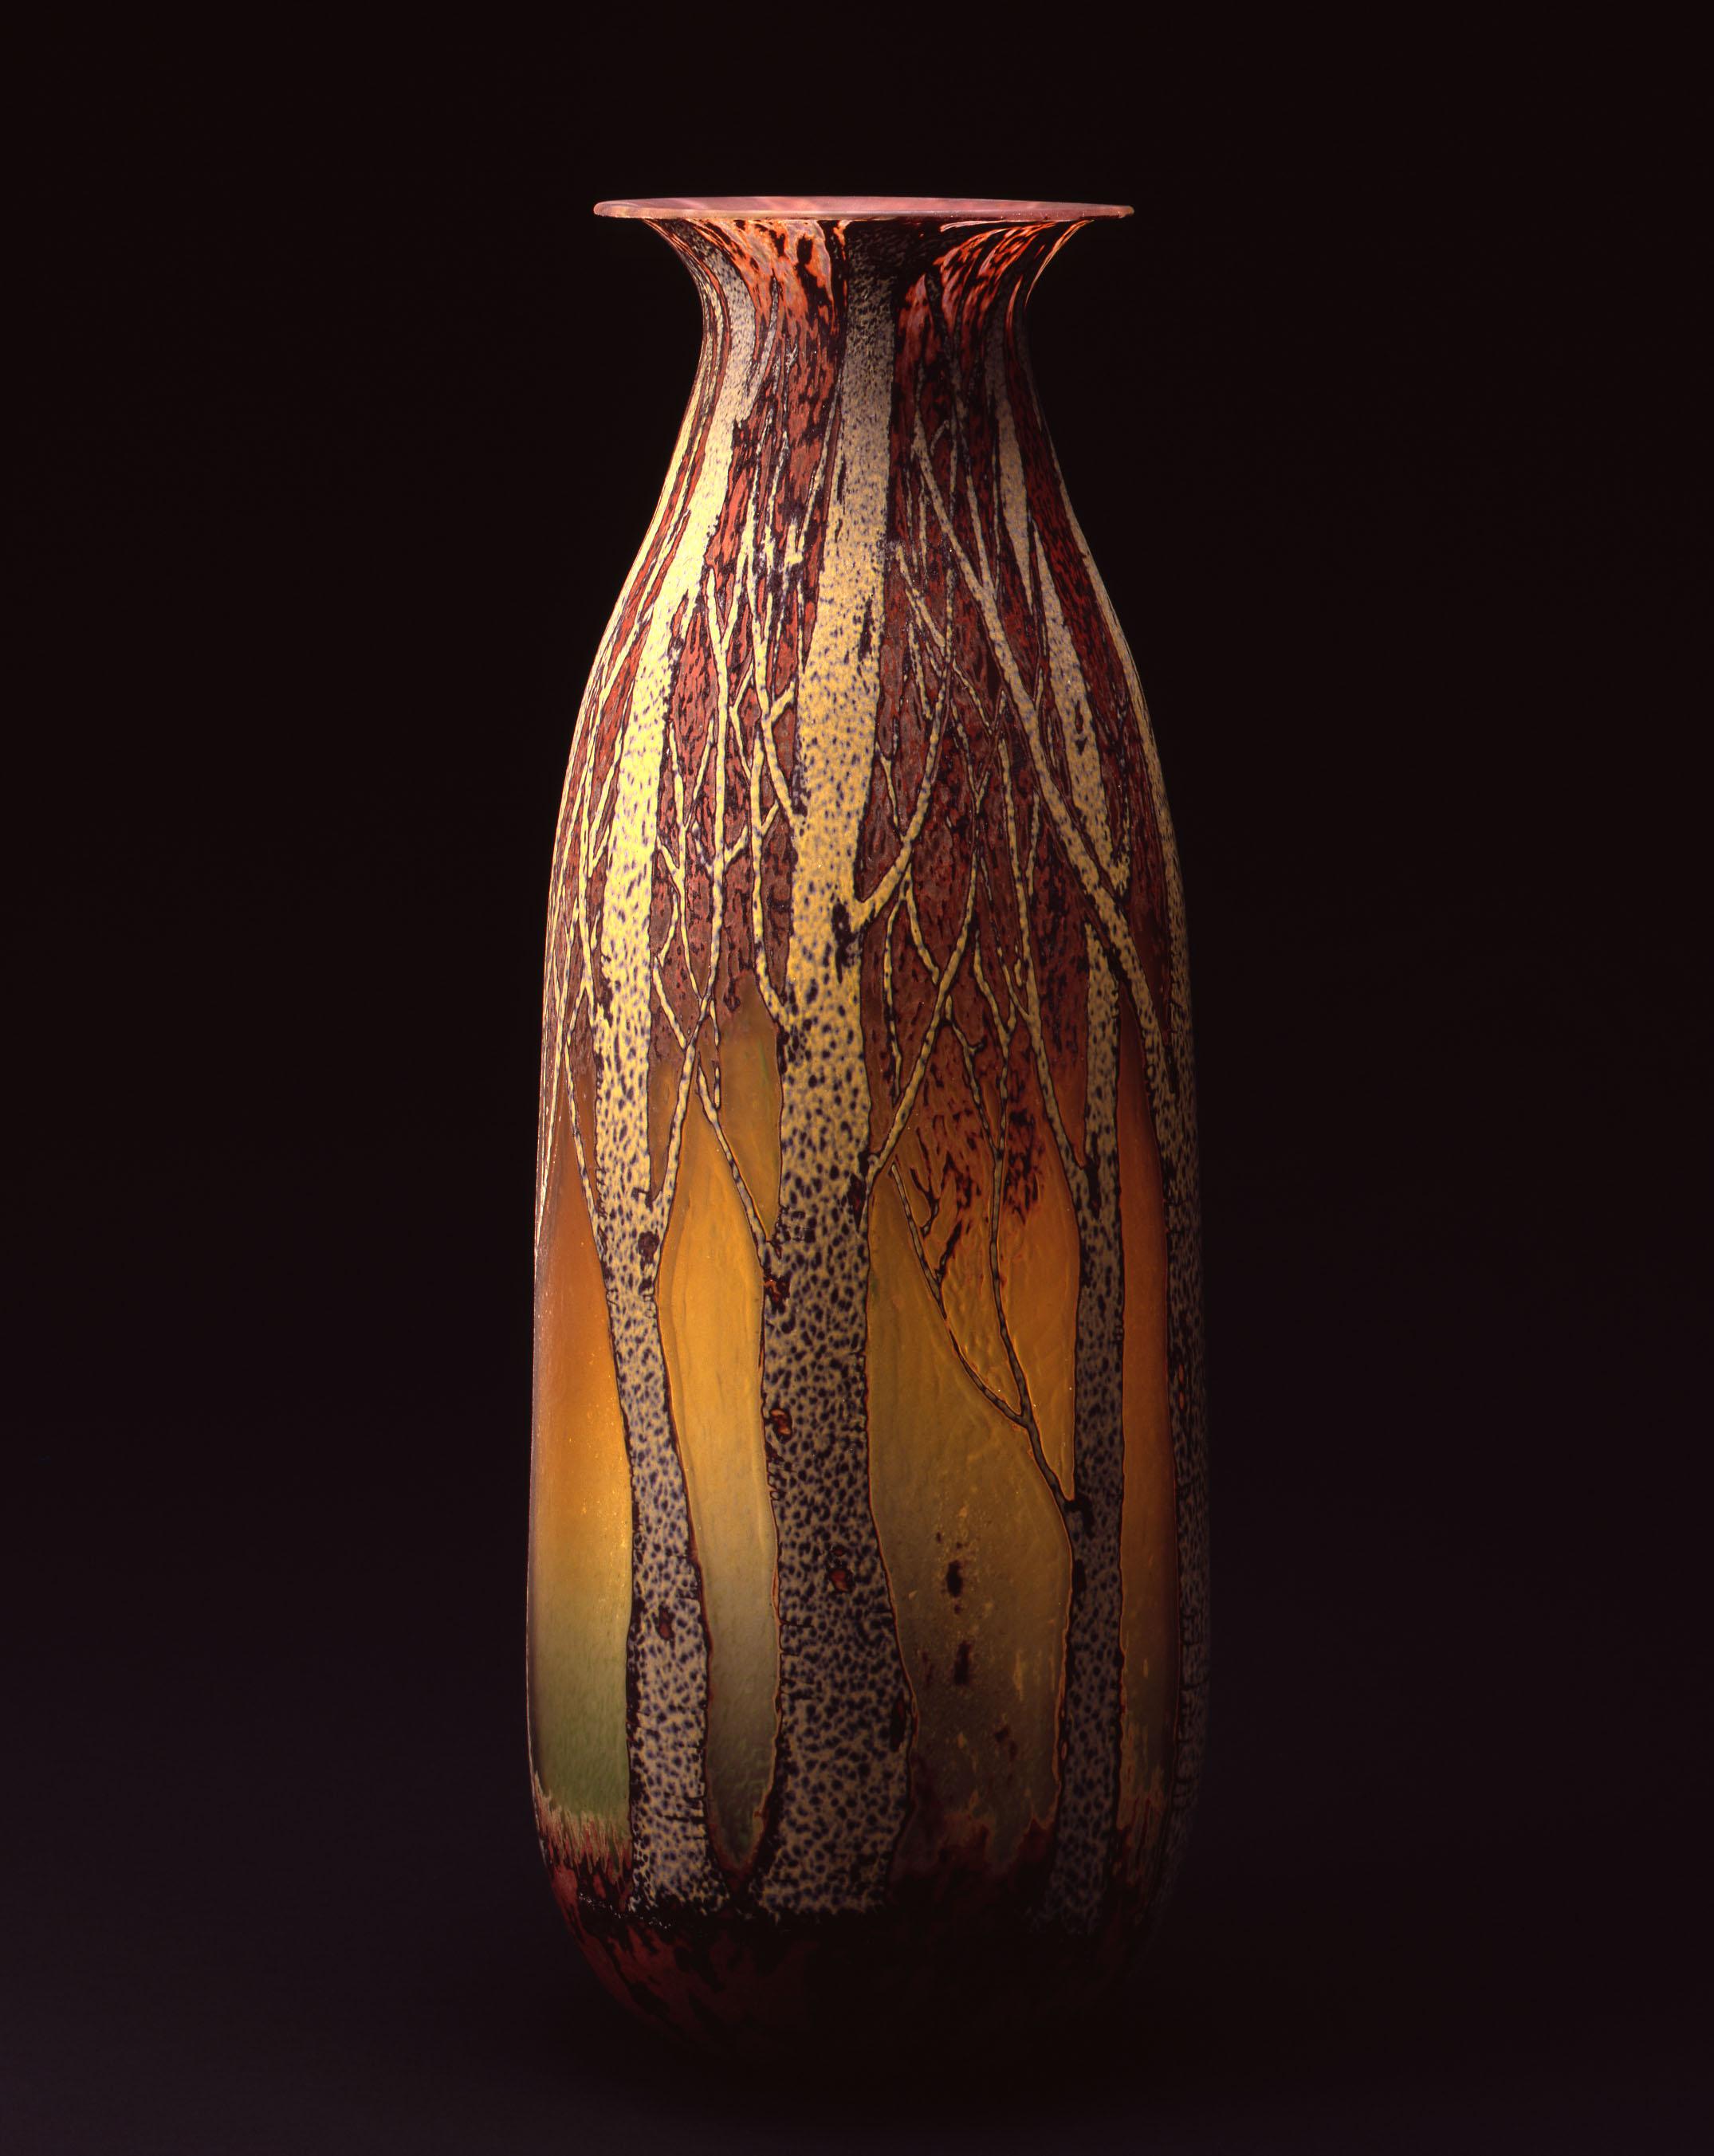 William Morris, Vase with Aspen Tree Grove   (2004, glass,26 1/2 x 10 x 10 inches), WM.32